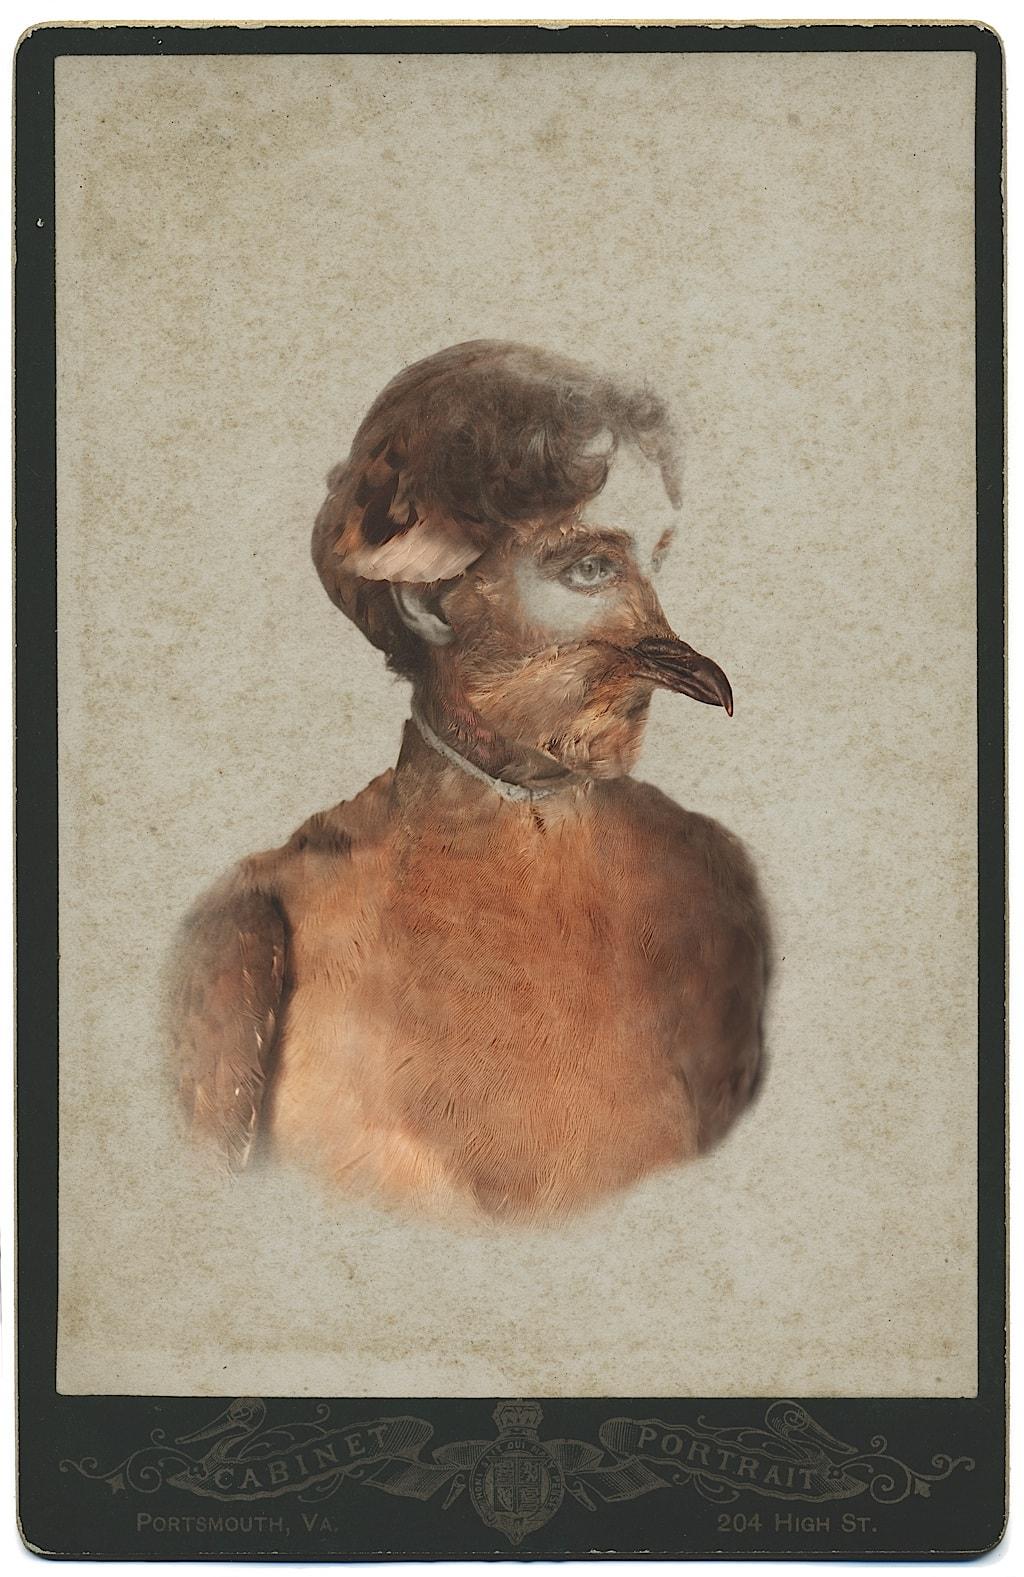 5.Female Passenger Pigeon- Sara Angelucci-reduced